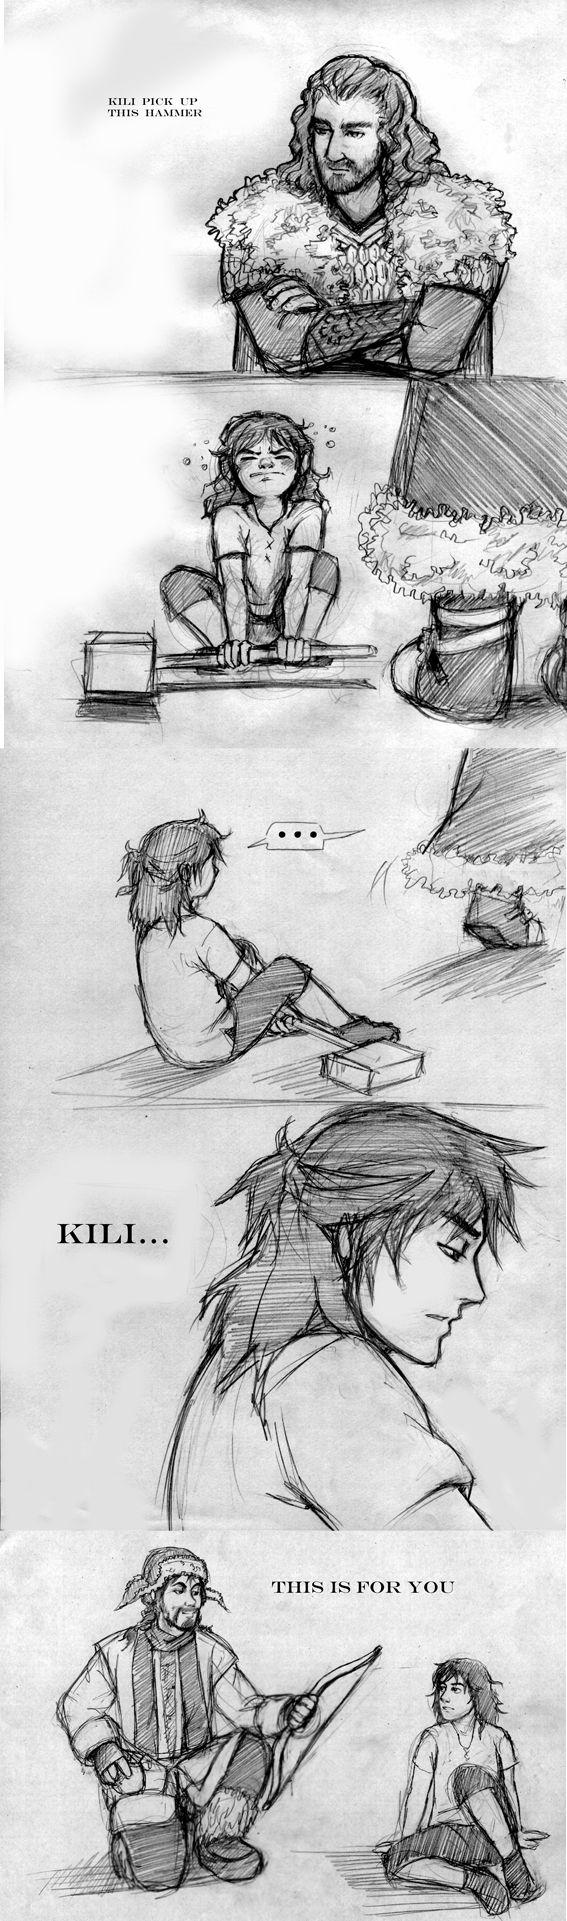 Yet another sad Kili pin. These actually make me sooooo sad. Kili is one of the best warriors among the dwarves!!! Thank you, Bofur for helping Kili! GO KILI :D